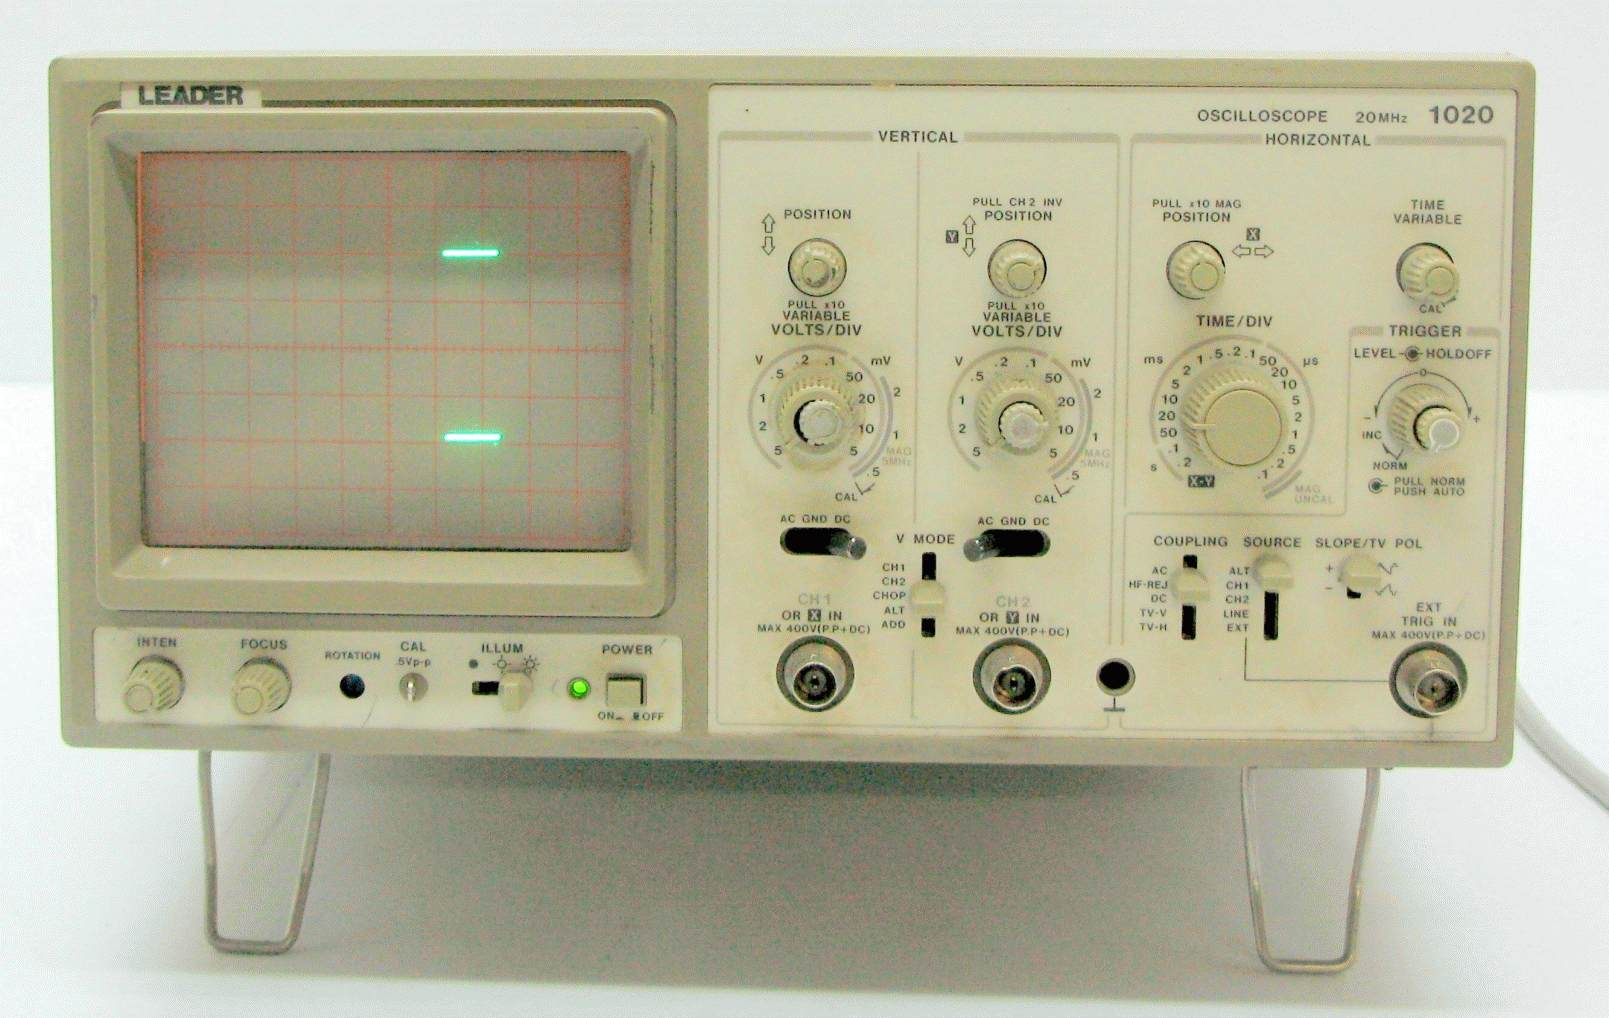 Leader Electronics Ls 1020 20Mhz, 2Ch Oscilloscope